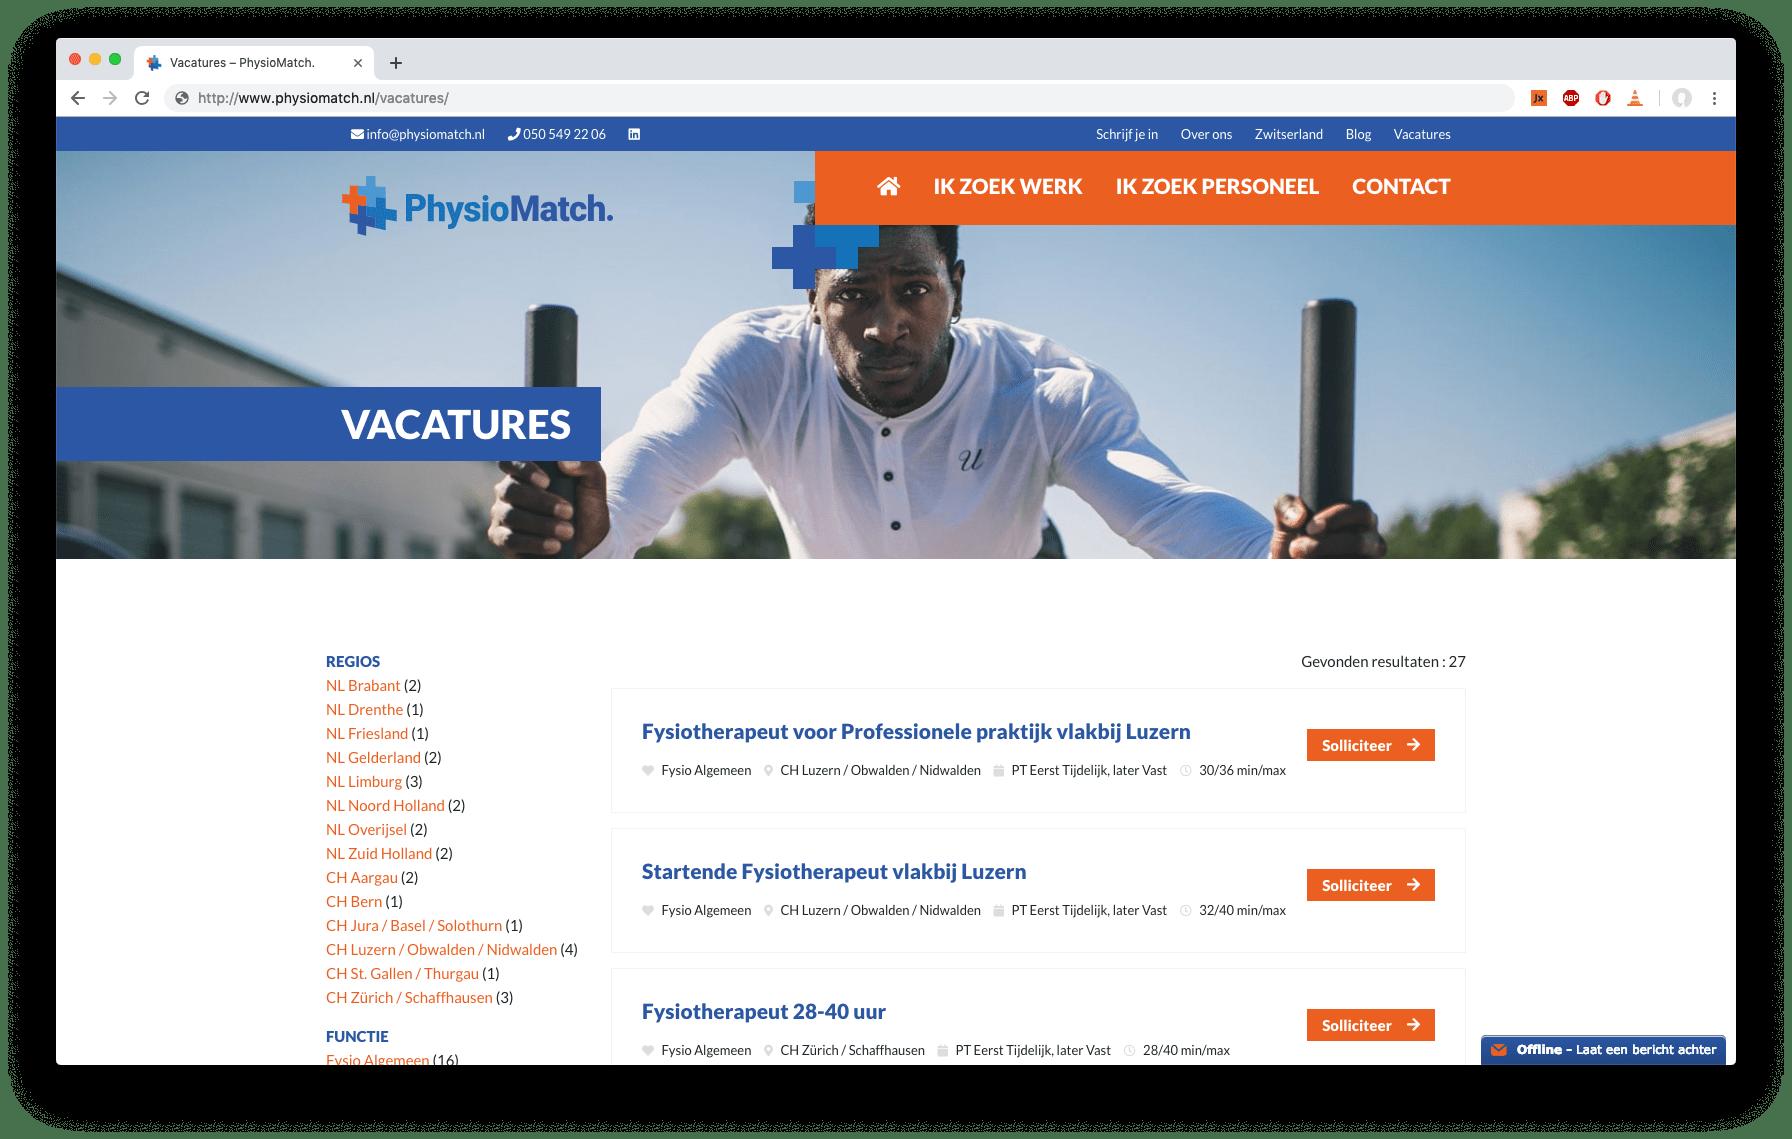 PhysioMatch.